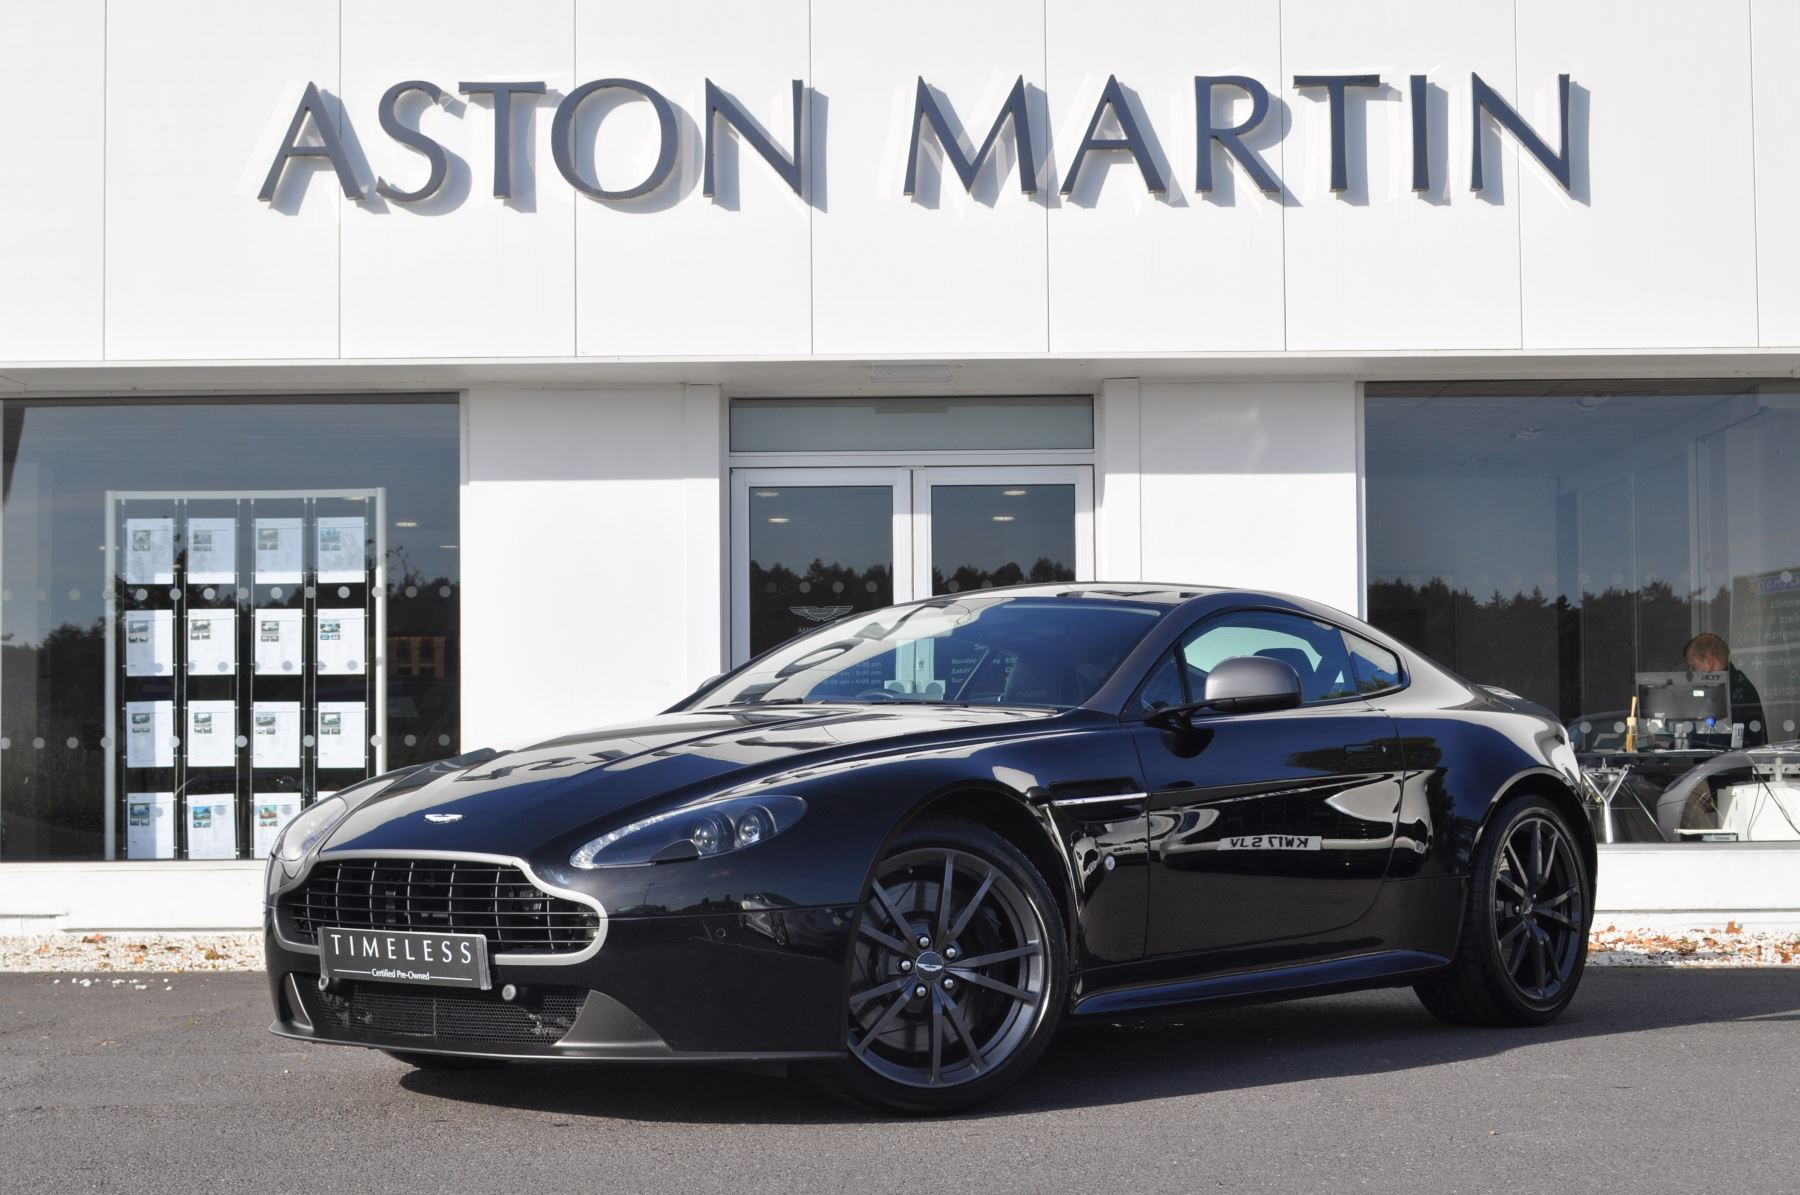 Aston Martin Vantage N430 N430 2dr Sportshift II 4.7 Automatic 3 door Coupe (2015)